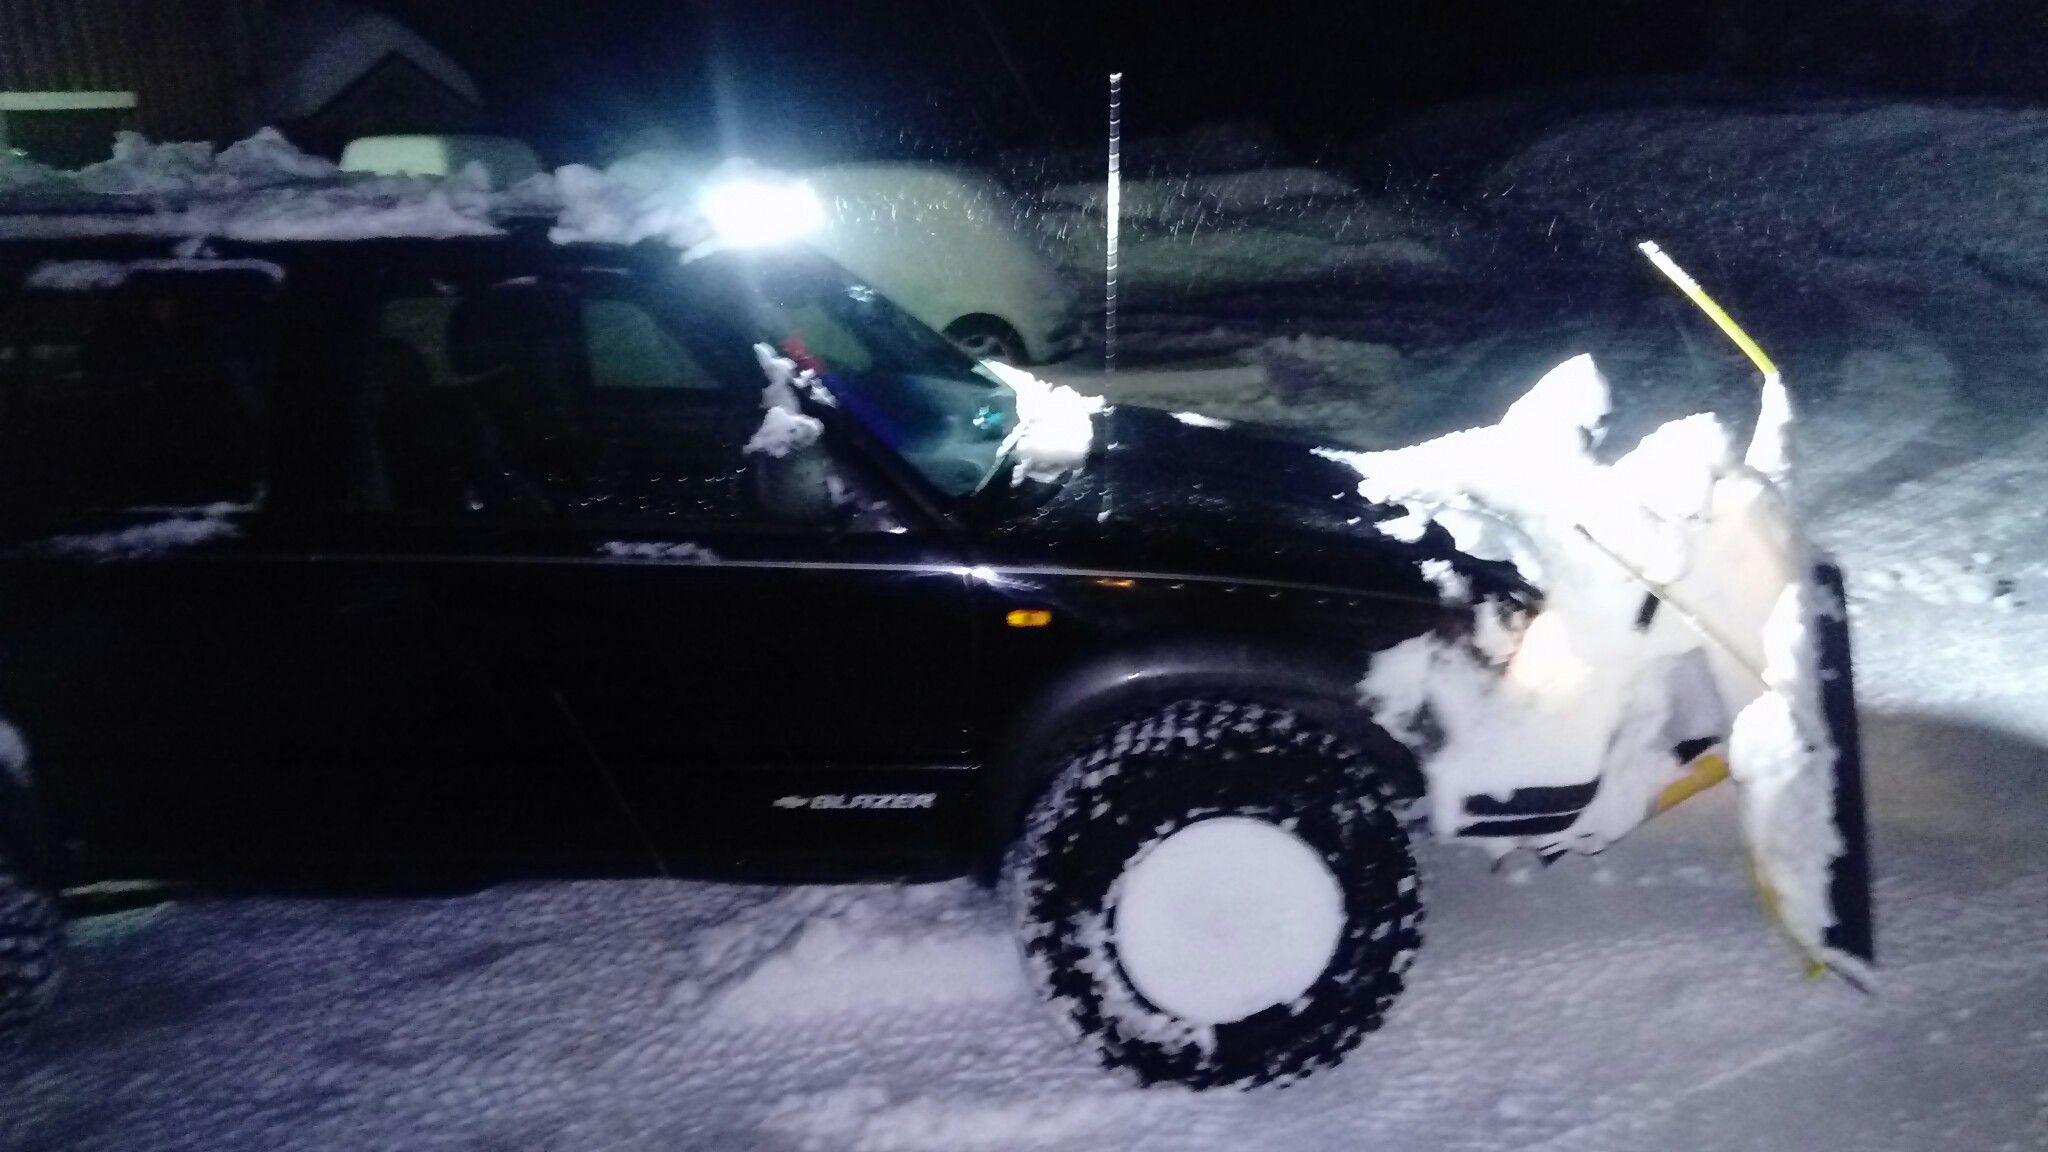 Snow plowin' with the ol' s10 blazer